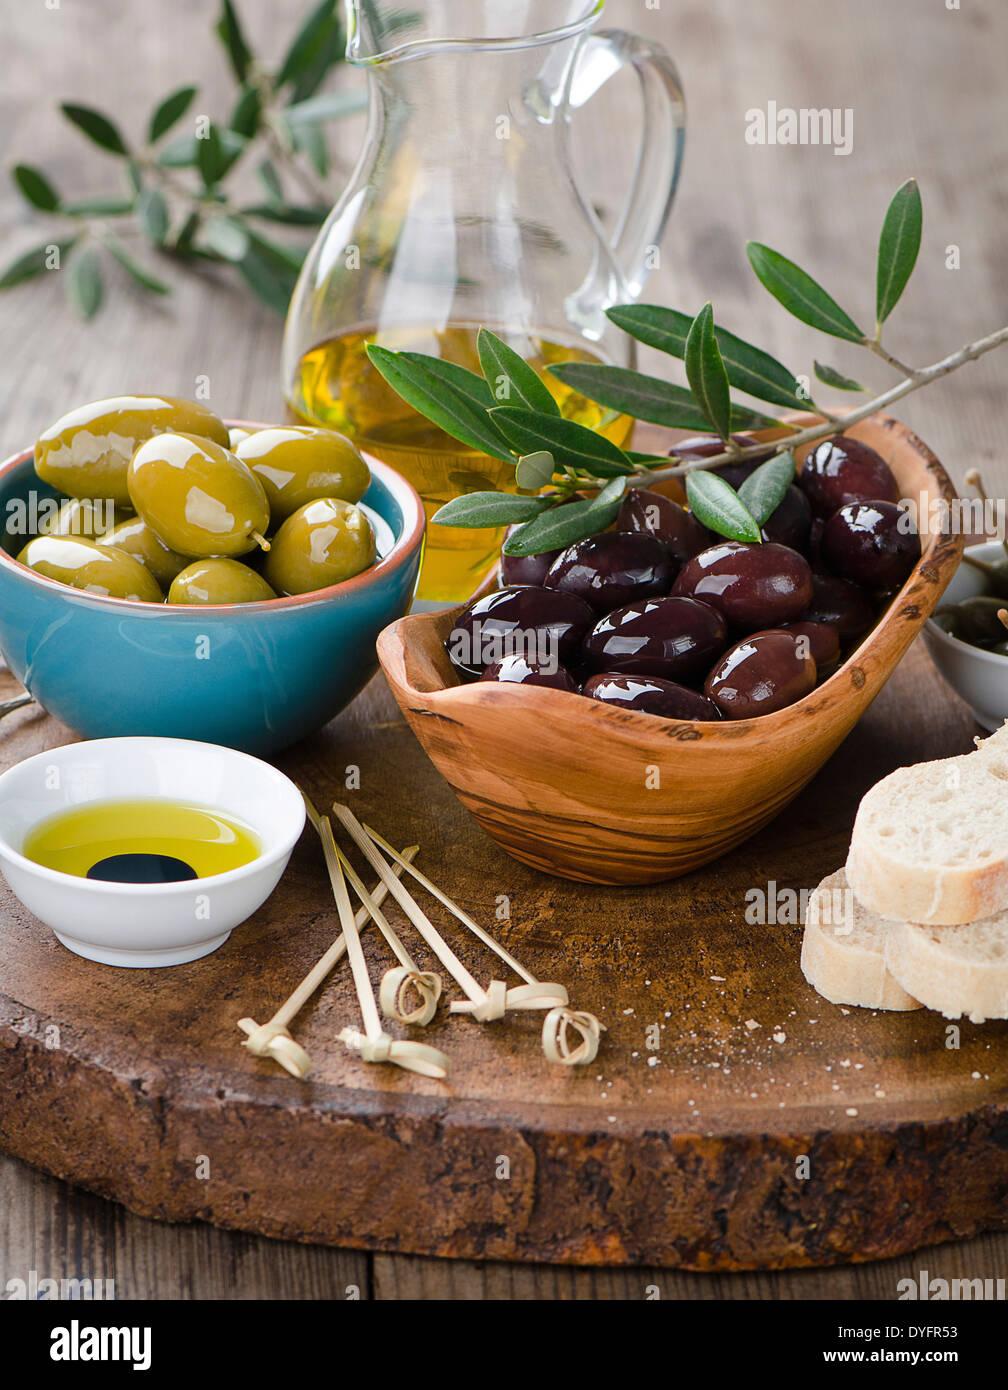 Fresh olives and olive oil platter - Stock Image